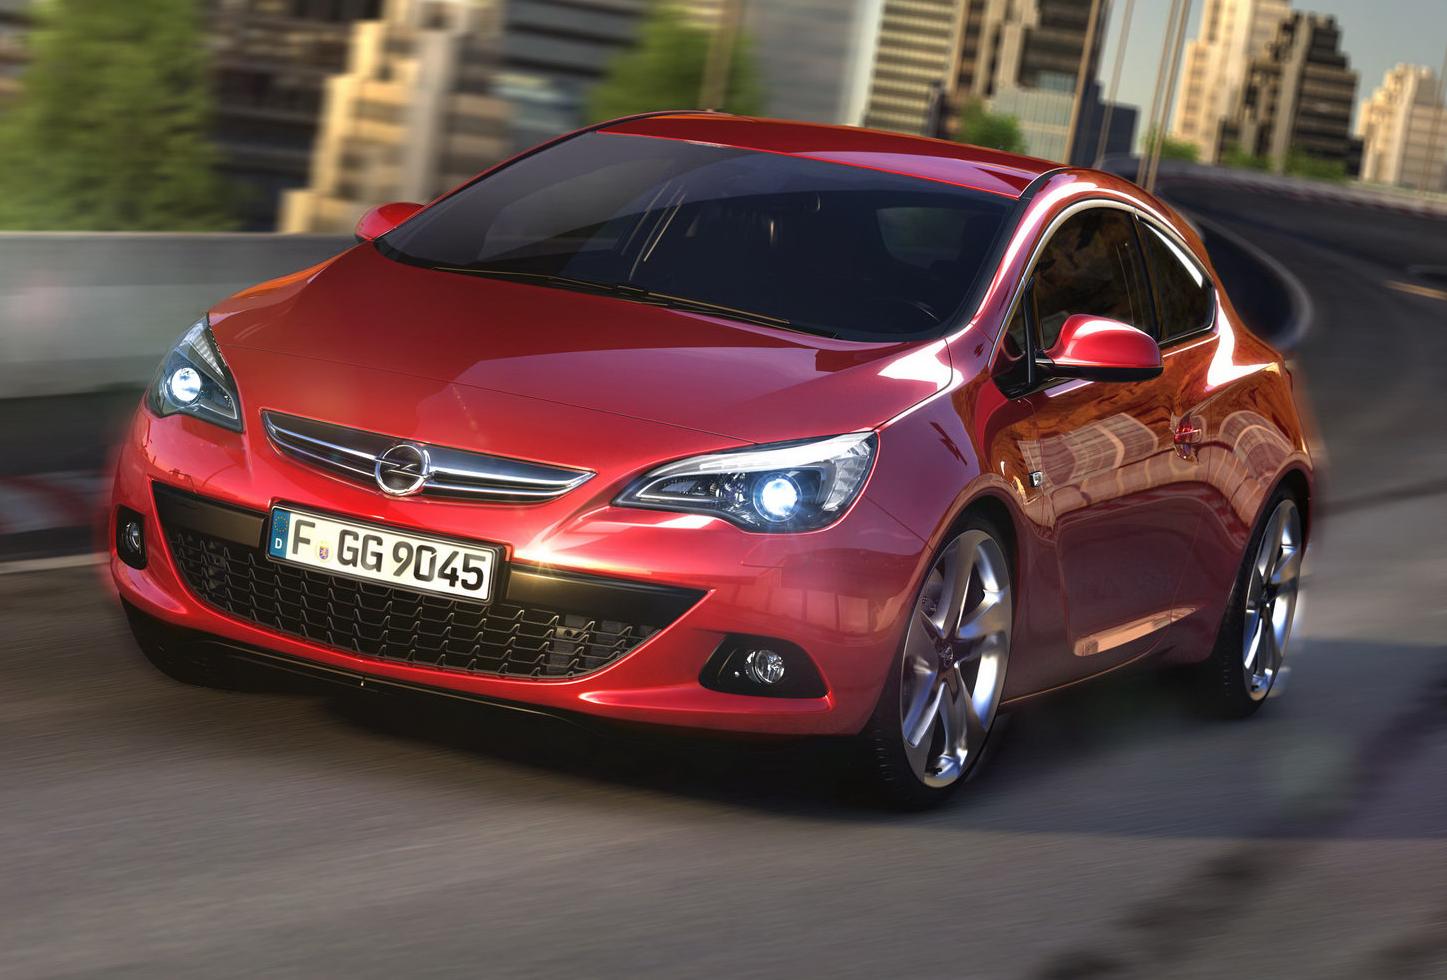 Opel Astra GTC Confirmed For Australia